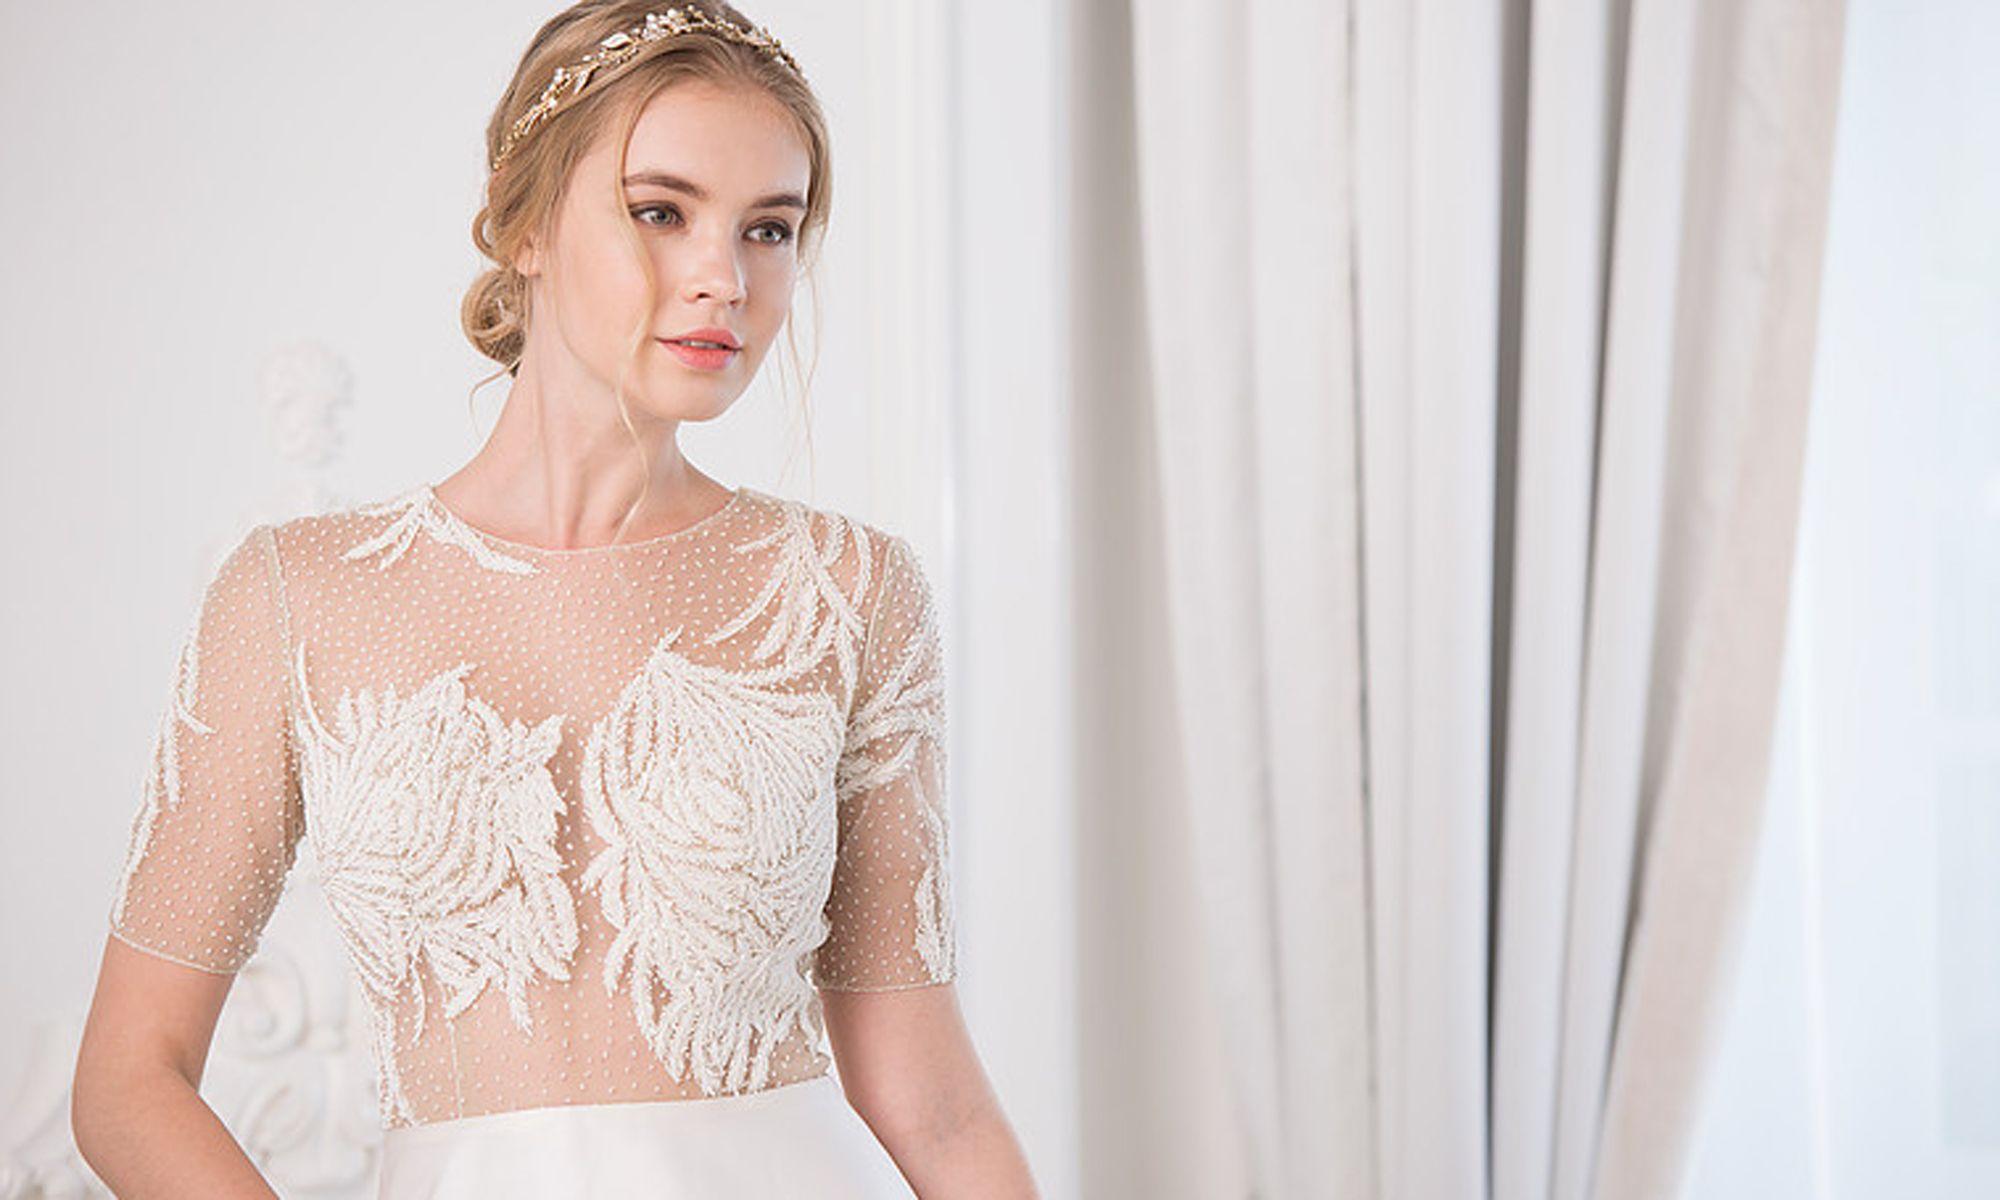 The 9 Best Designer Bridal Boutiques in Hong Kong | Hong Kong Tatler